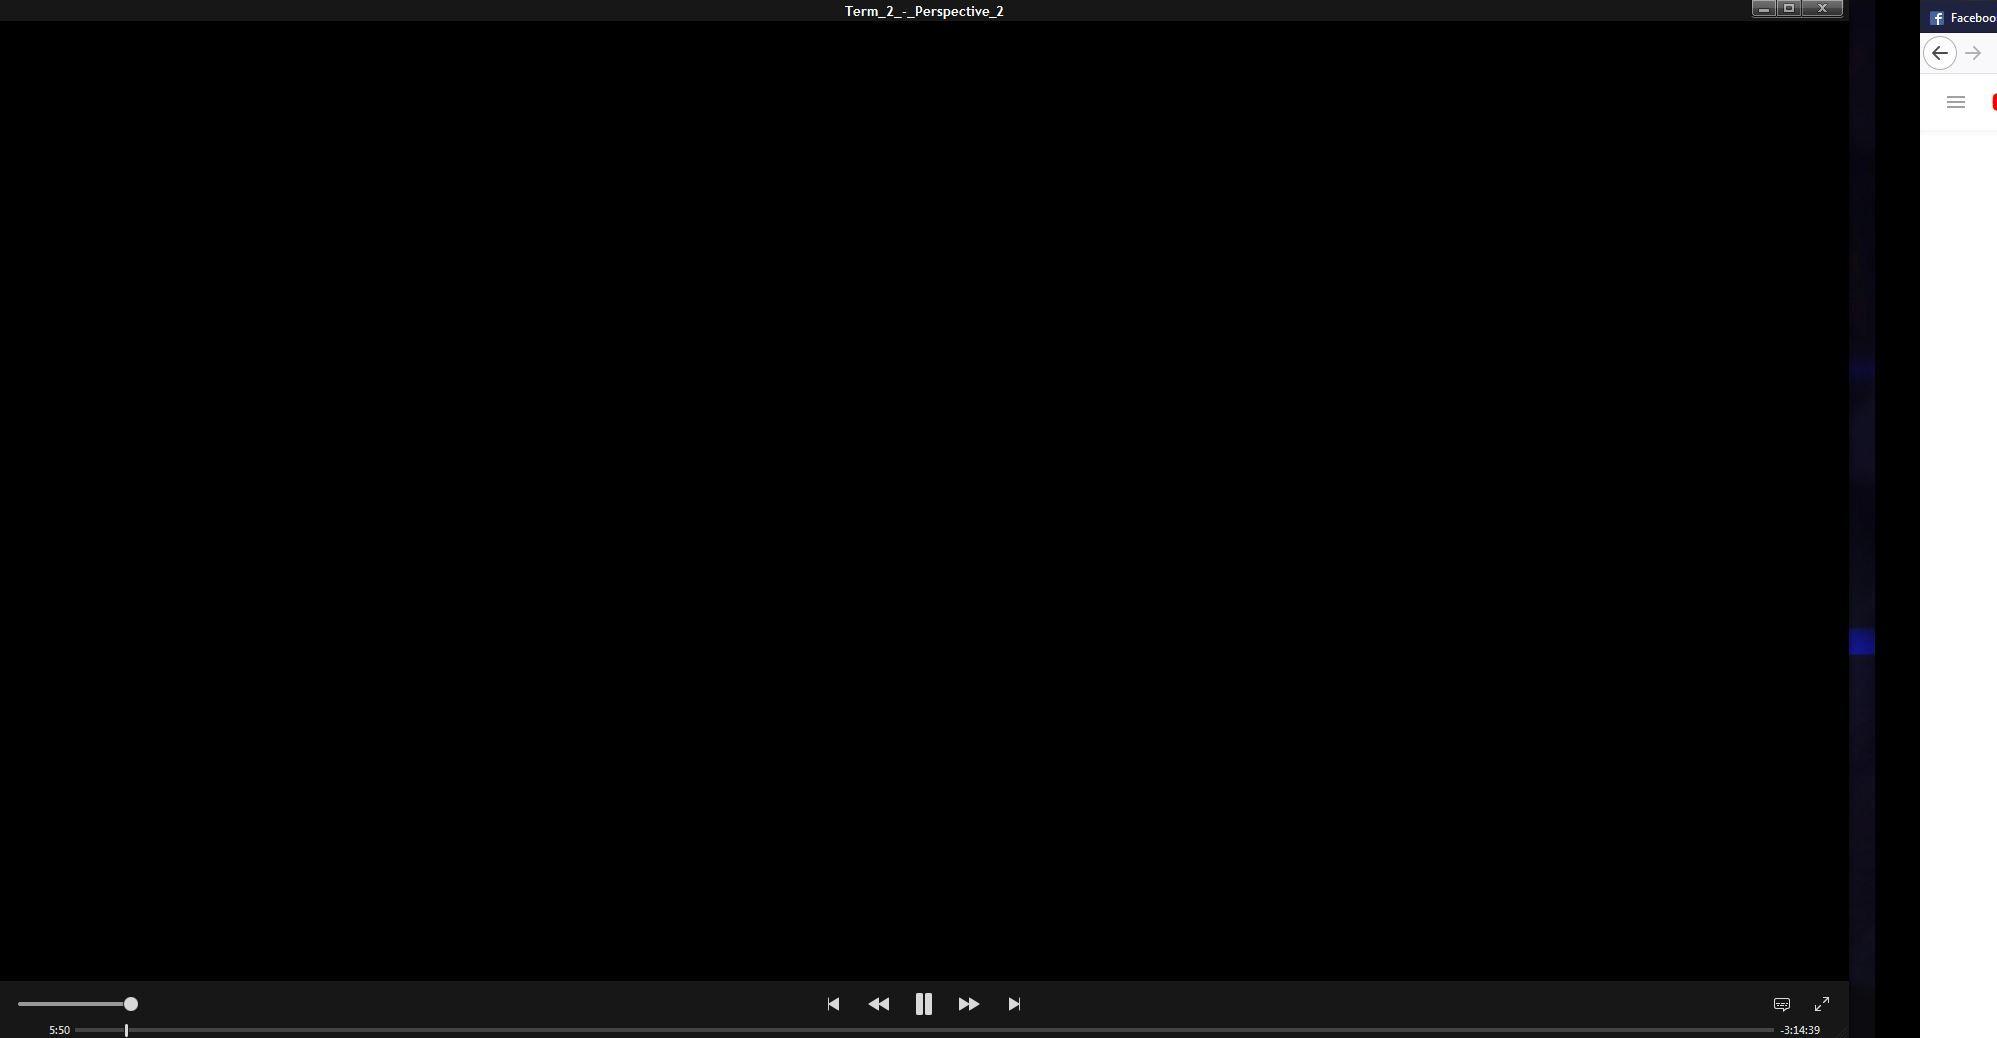 Help tutorial video wont work in itunes help center forums error 1g1997x1038 253 kb baditri Image collections